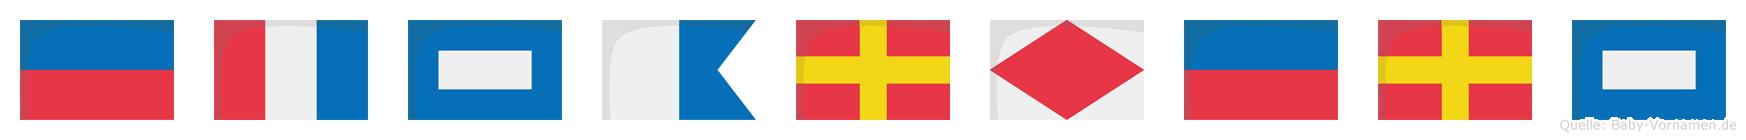 Etparferp im Flaggenalphabet